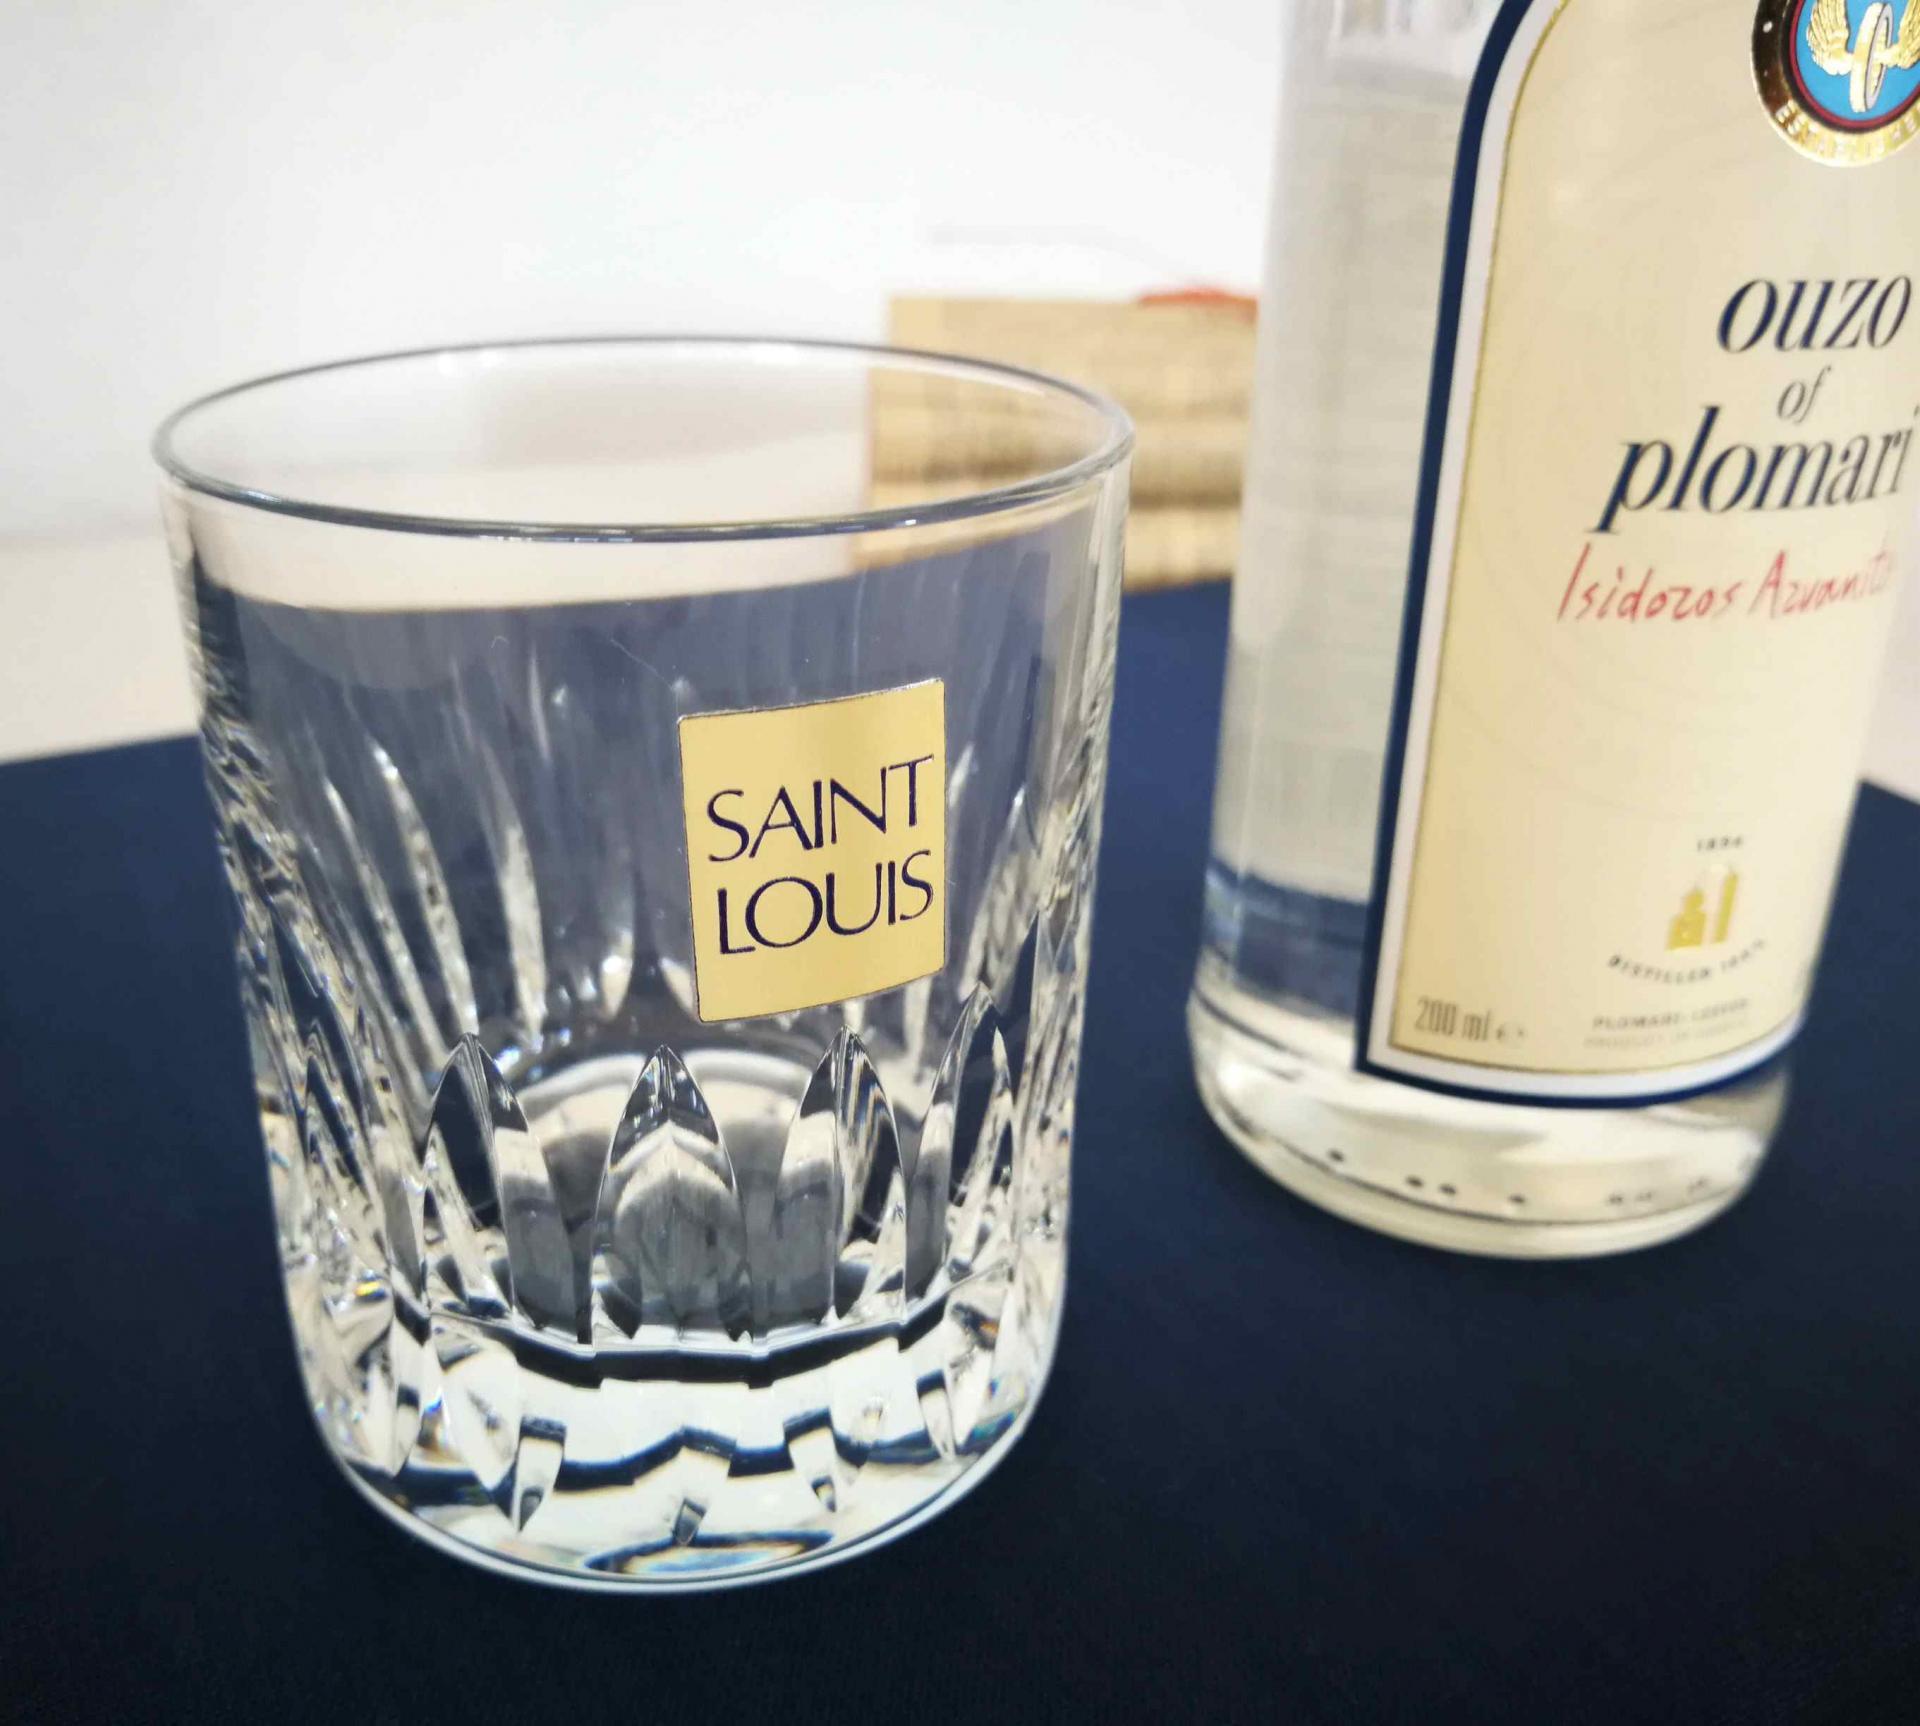 Gobelet en cristal Saint Louis. Marine